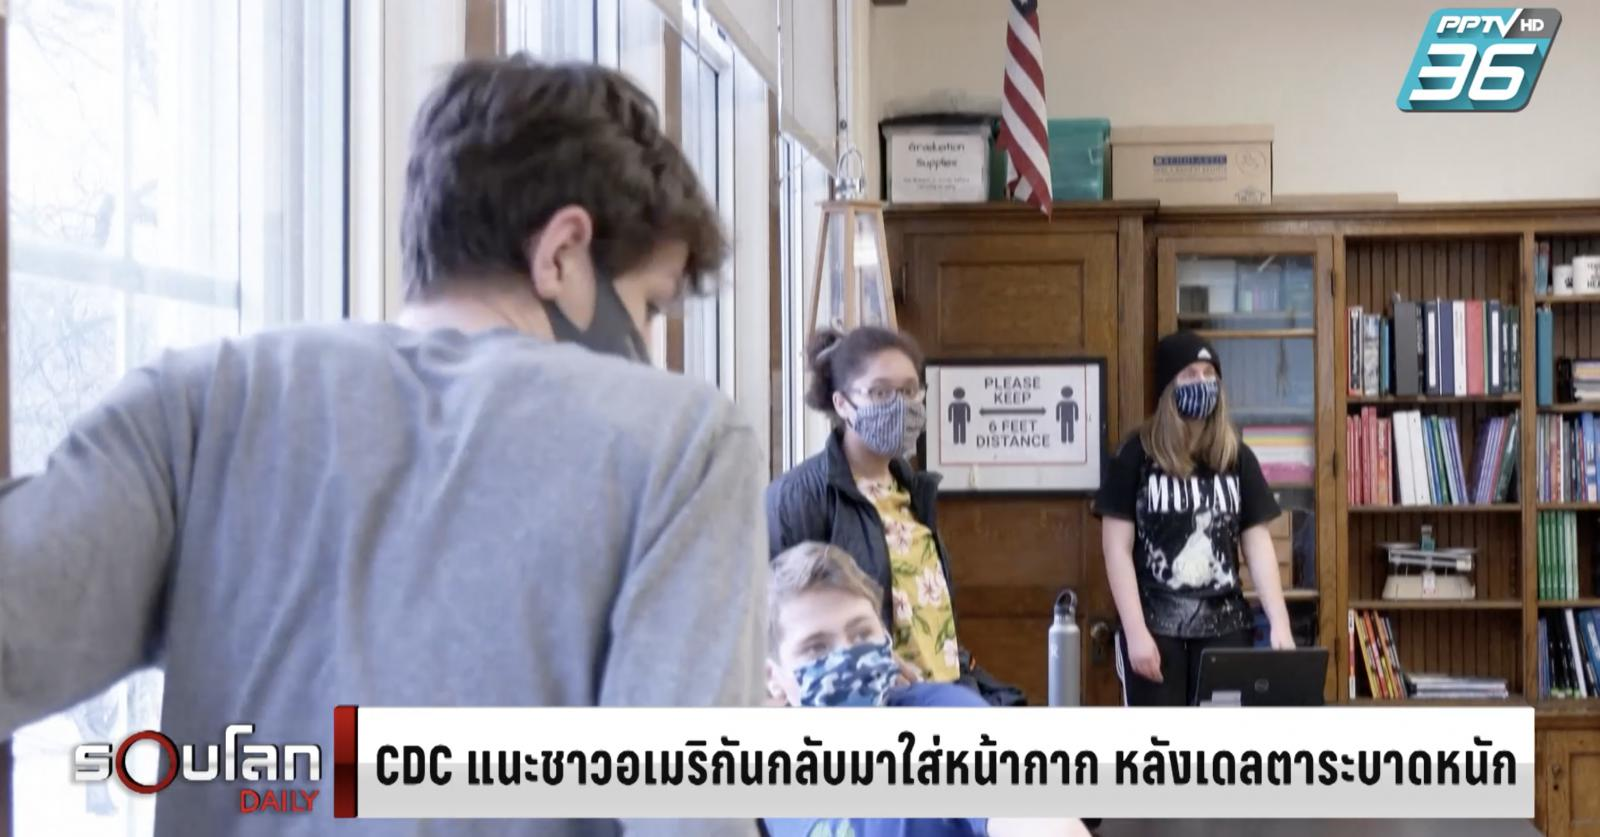 CDC แนะชาวอเมริกันกลับมาใส่หน้ากาก หลังเดลตาระบาดหนัก